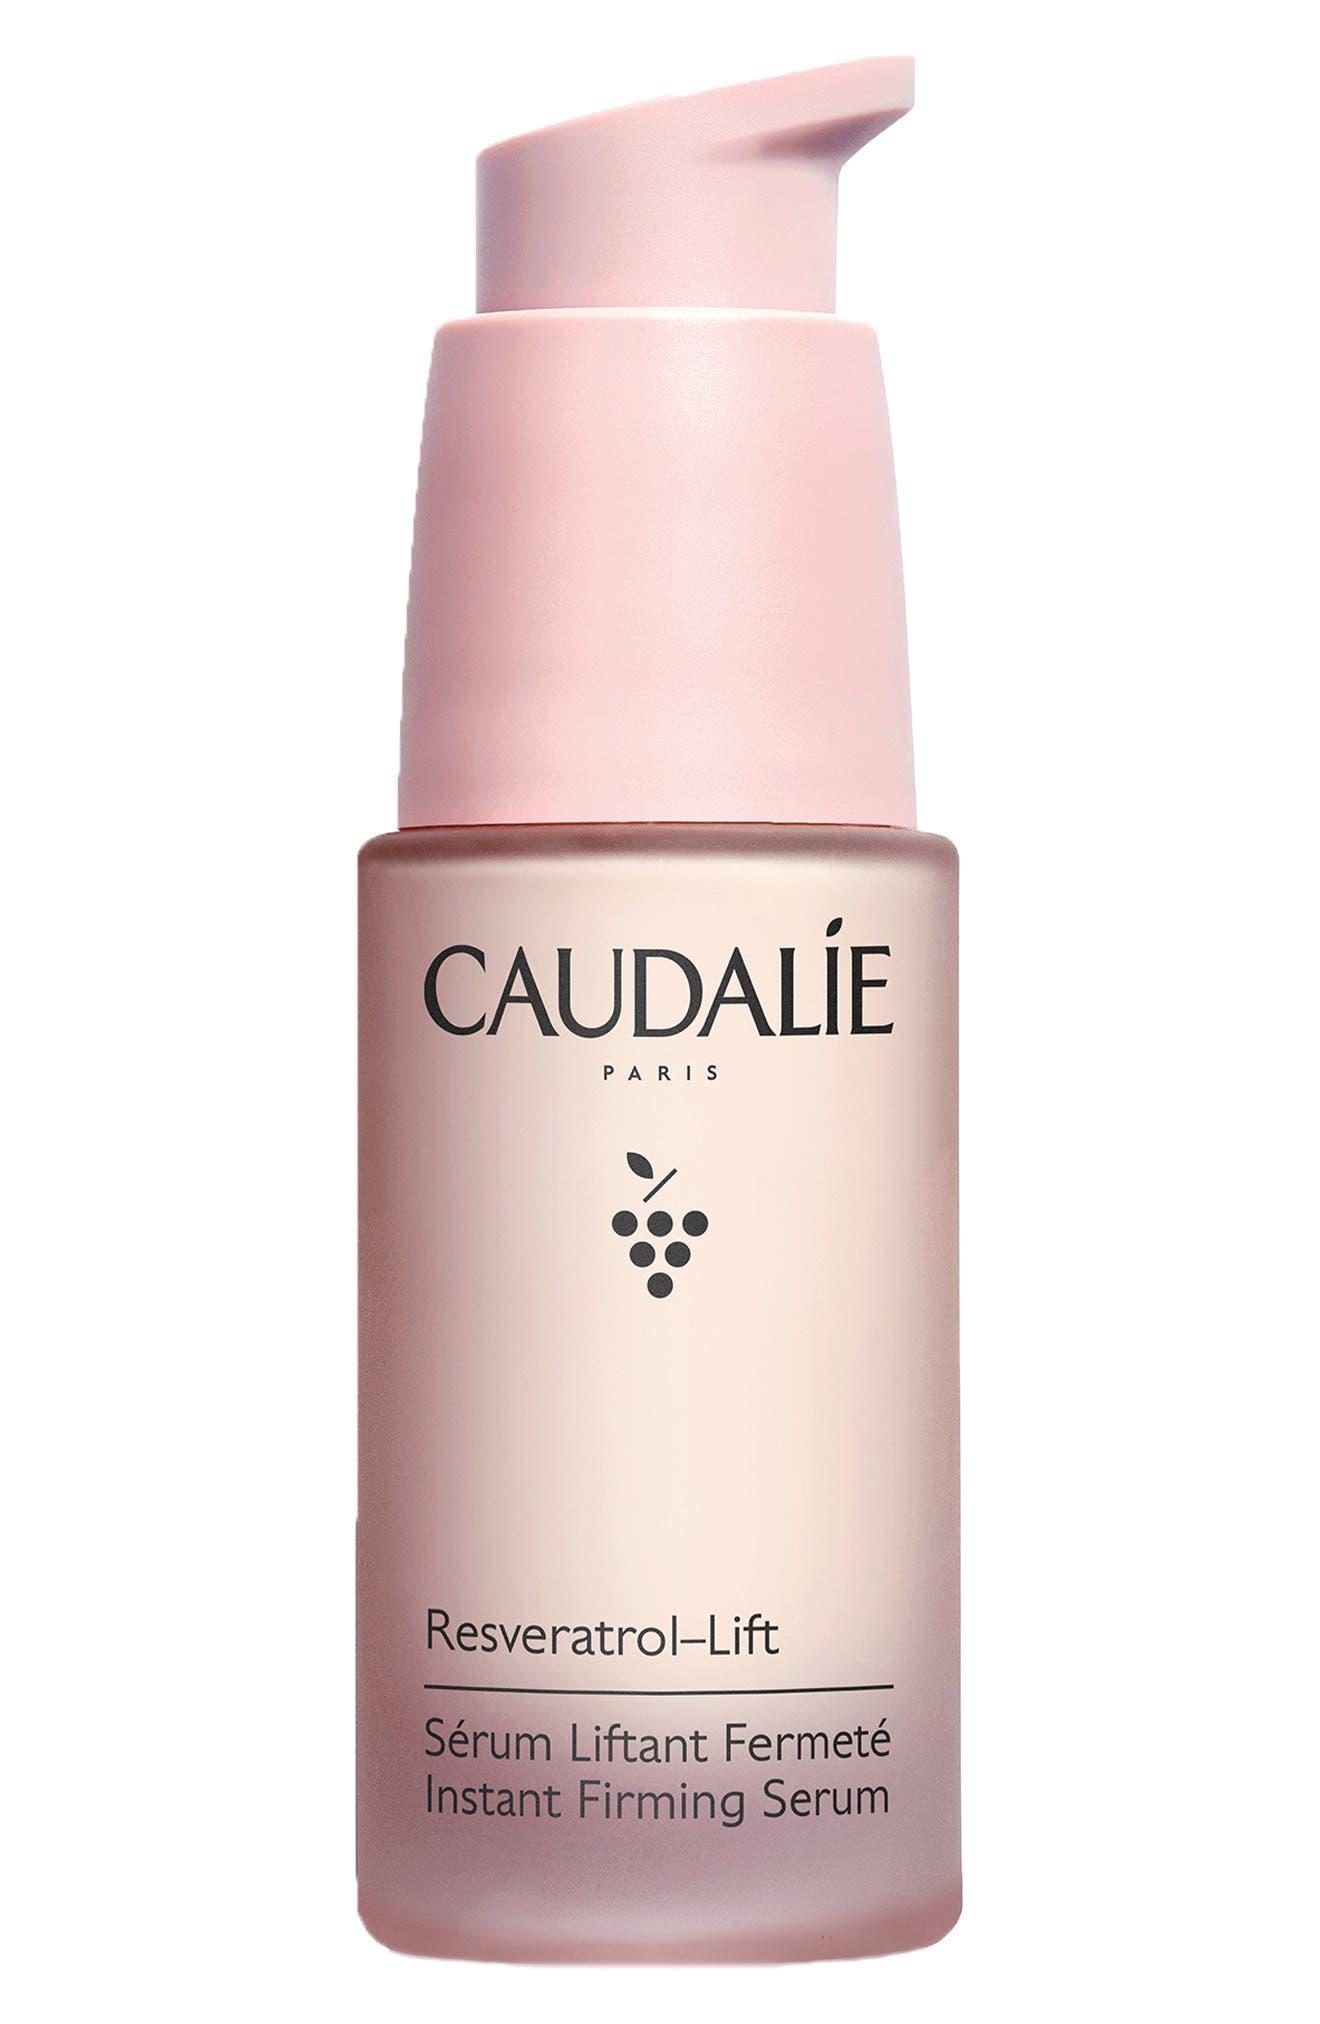 Resveratrol-Lift Instant Firming Serum